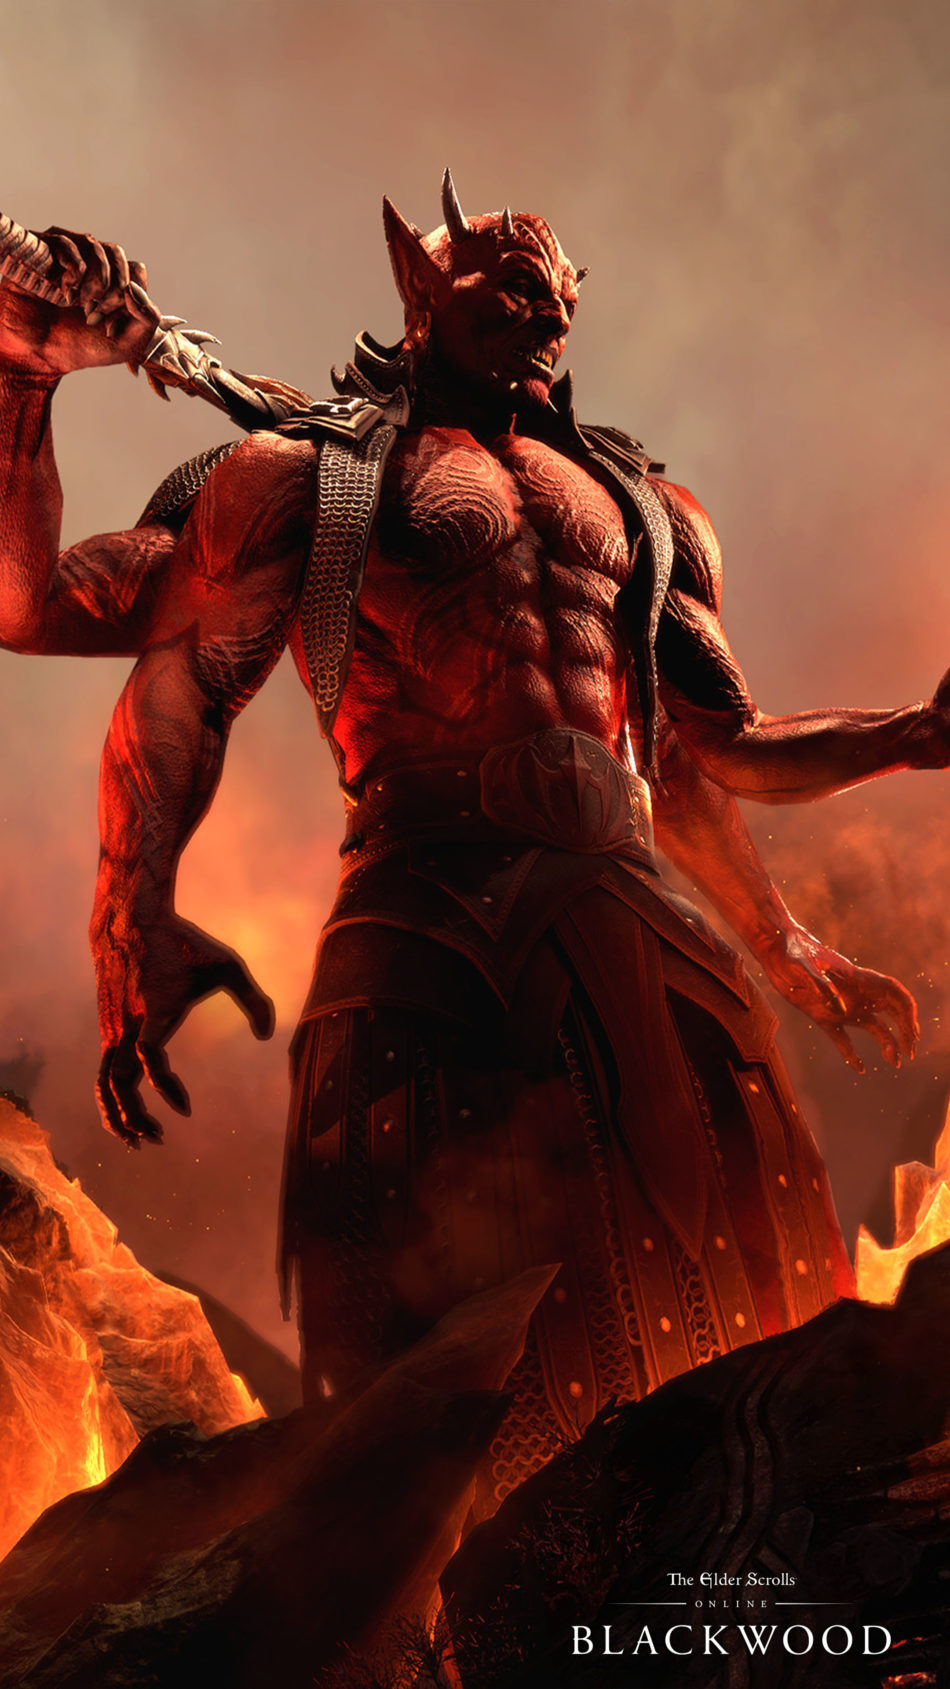 The Elder Scrolls Online - Blackwood Game Monster 4K Ultra HD Mobile Wallpaper